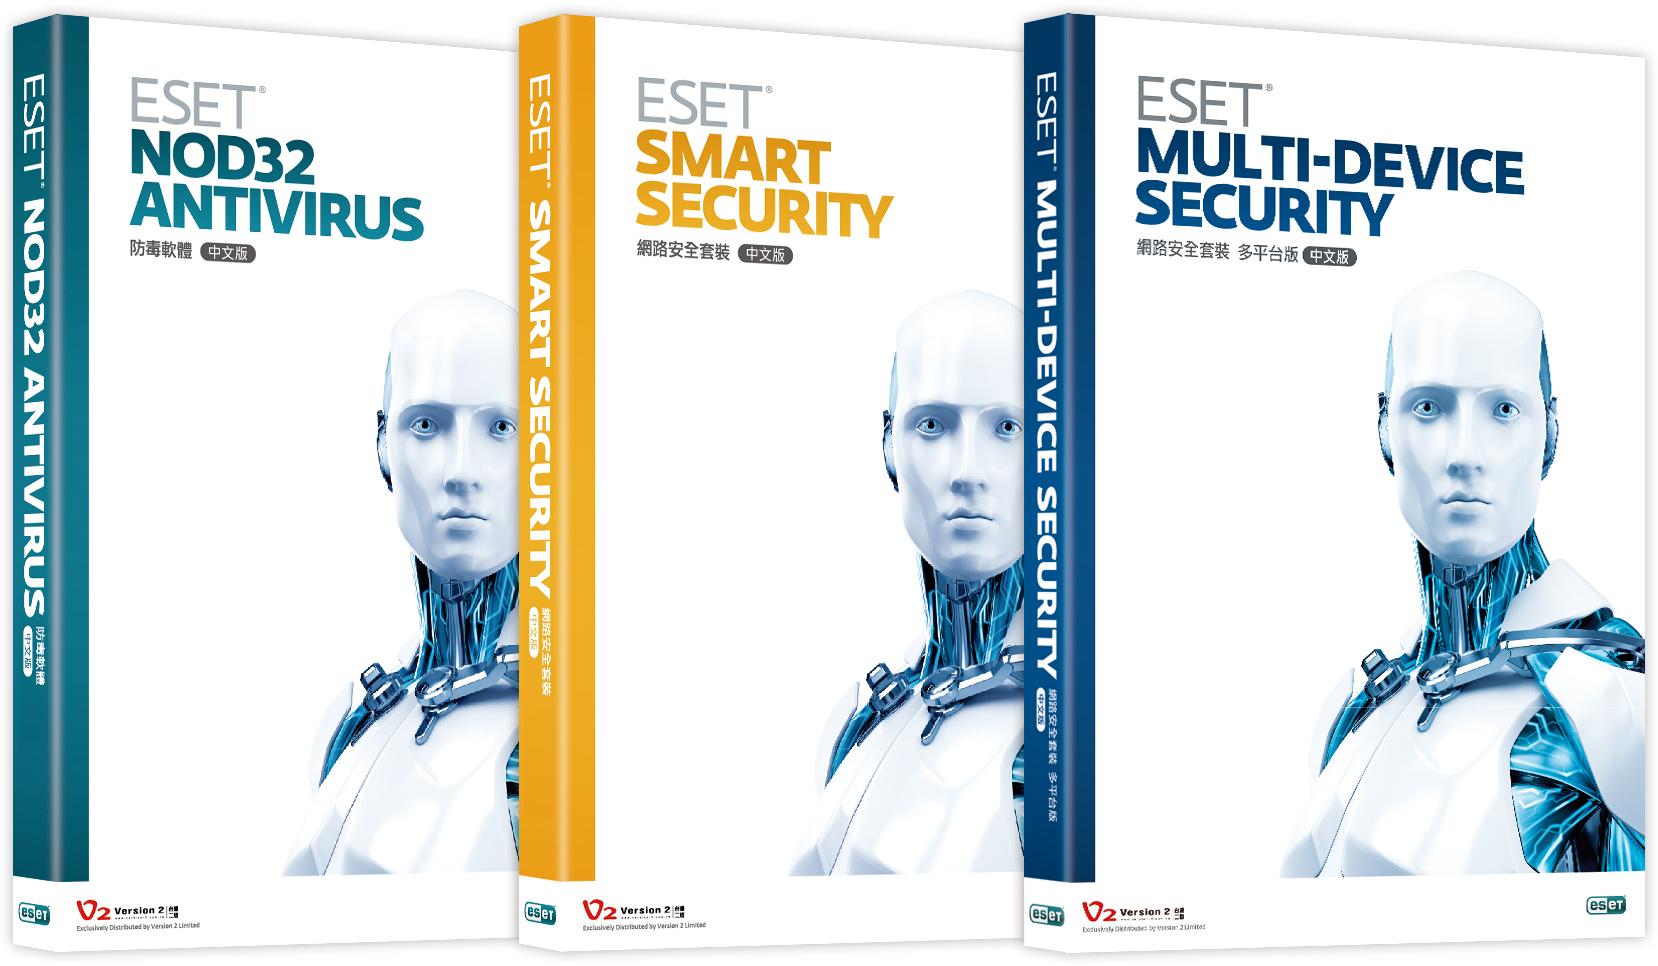 ESET榮獲AV-TEST優良防毒產品認證,好禮成雙大進擊!